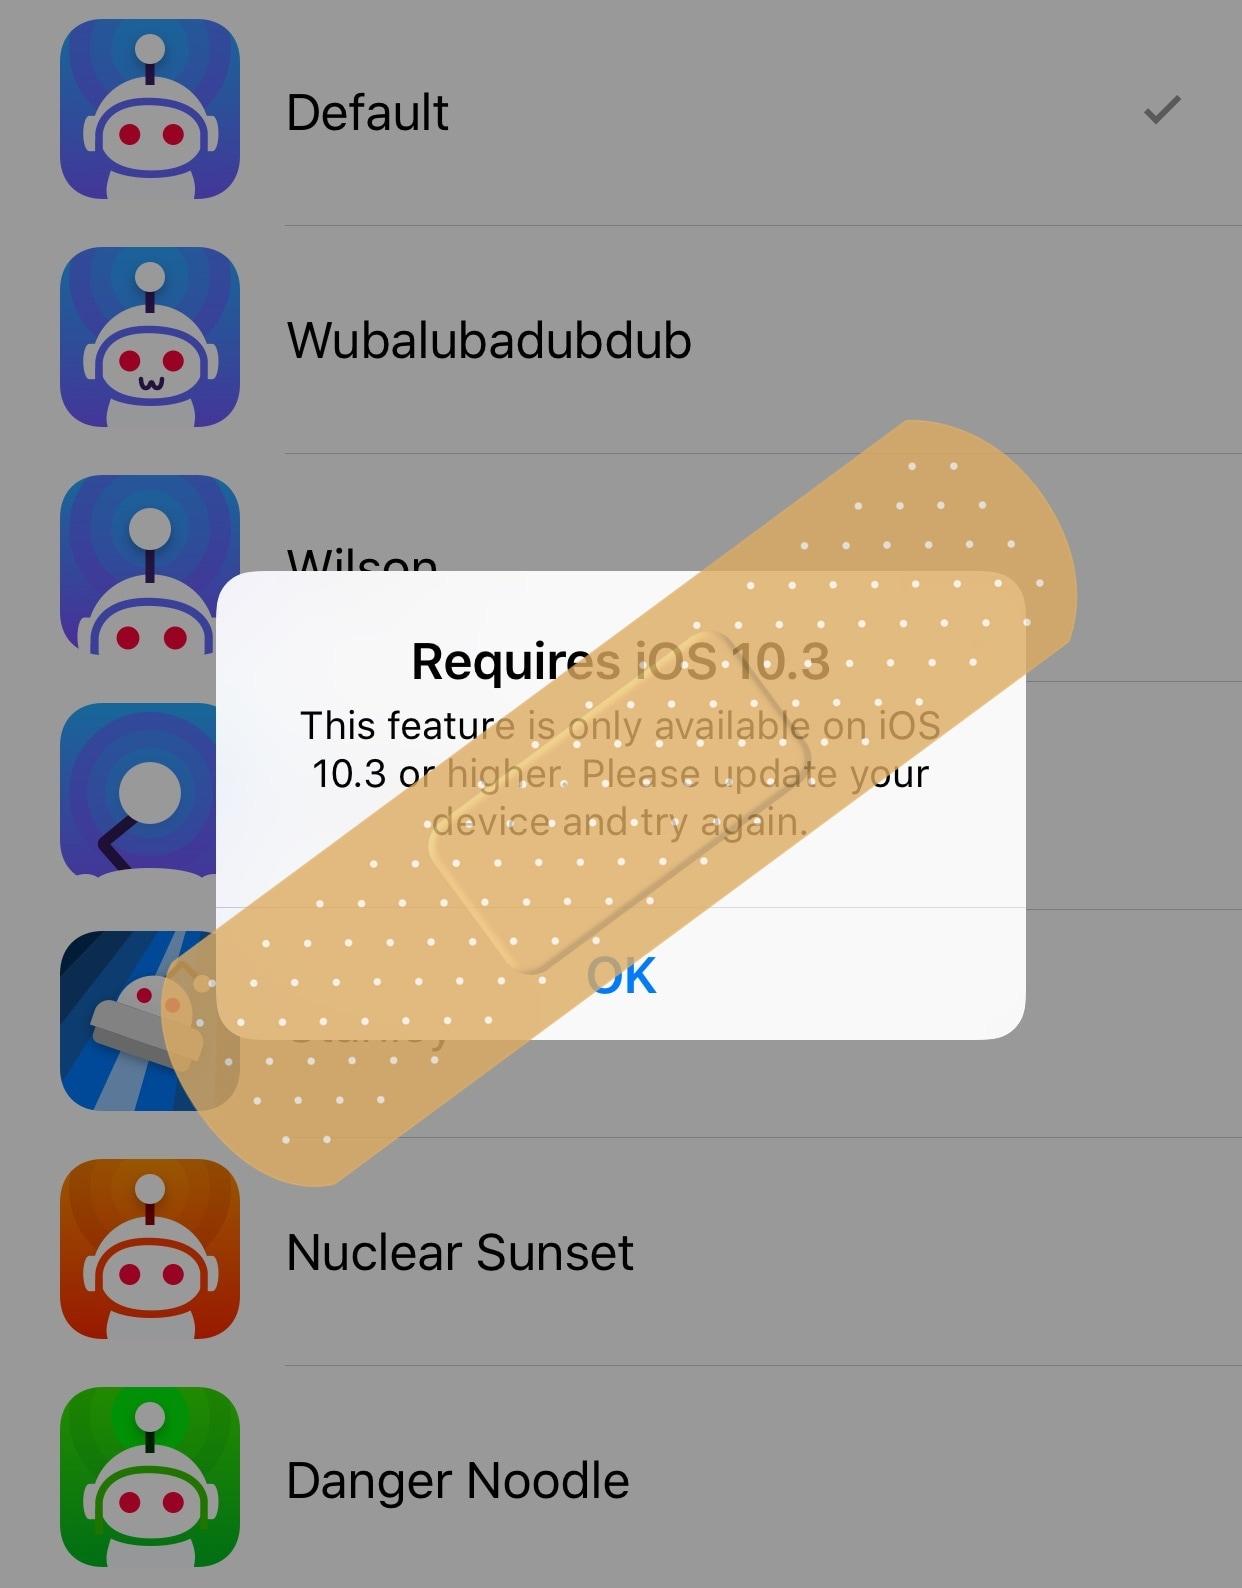 This tweak hides features in the Apollo Reddit client that don't